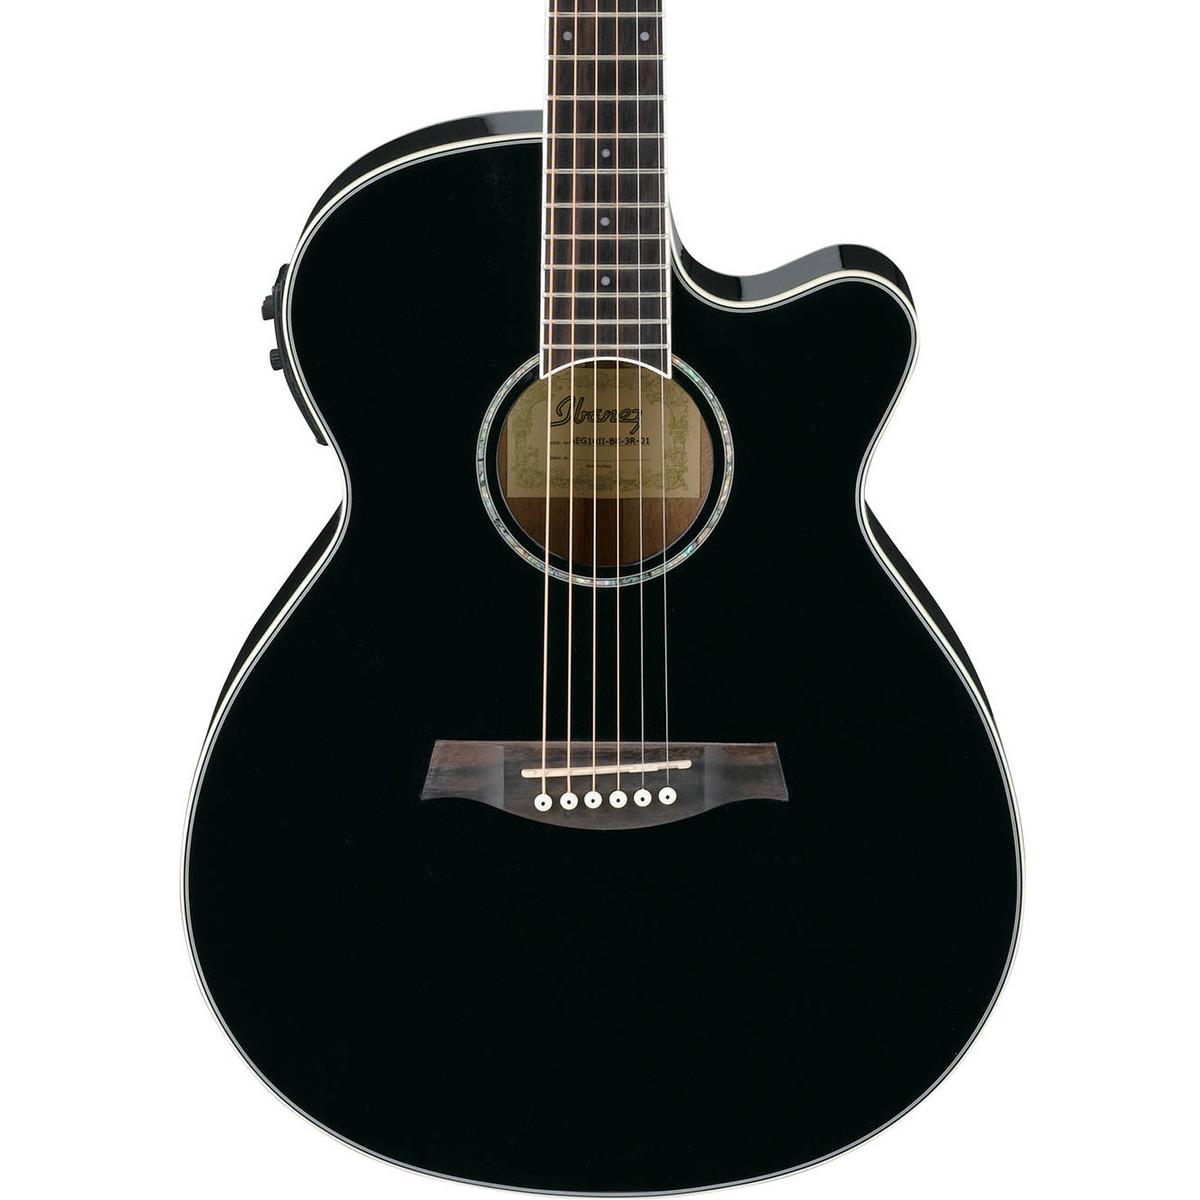 Ibanez Electro Acoustic Guitars : ibanez aeg10ii electro acoustic guitar black b stock at gear4music ~ Russianpoet.info Haus und Dekorationen